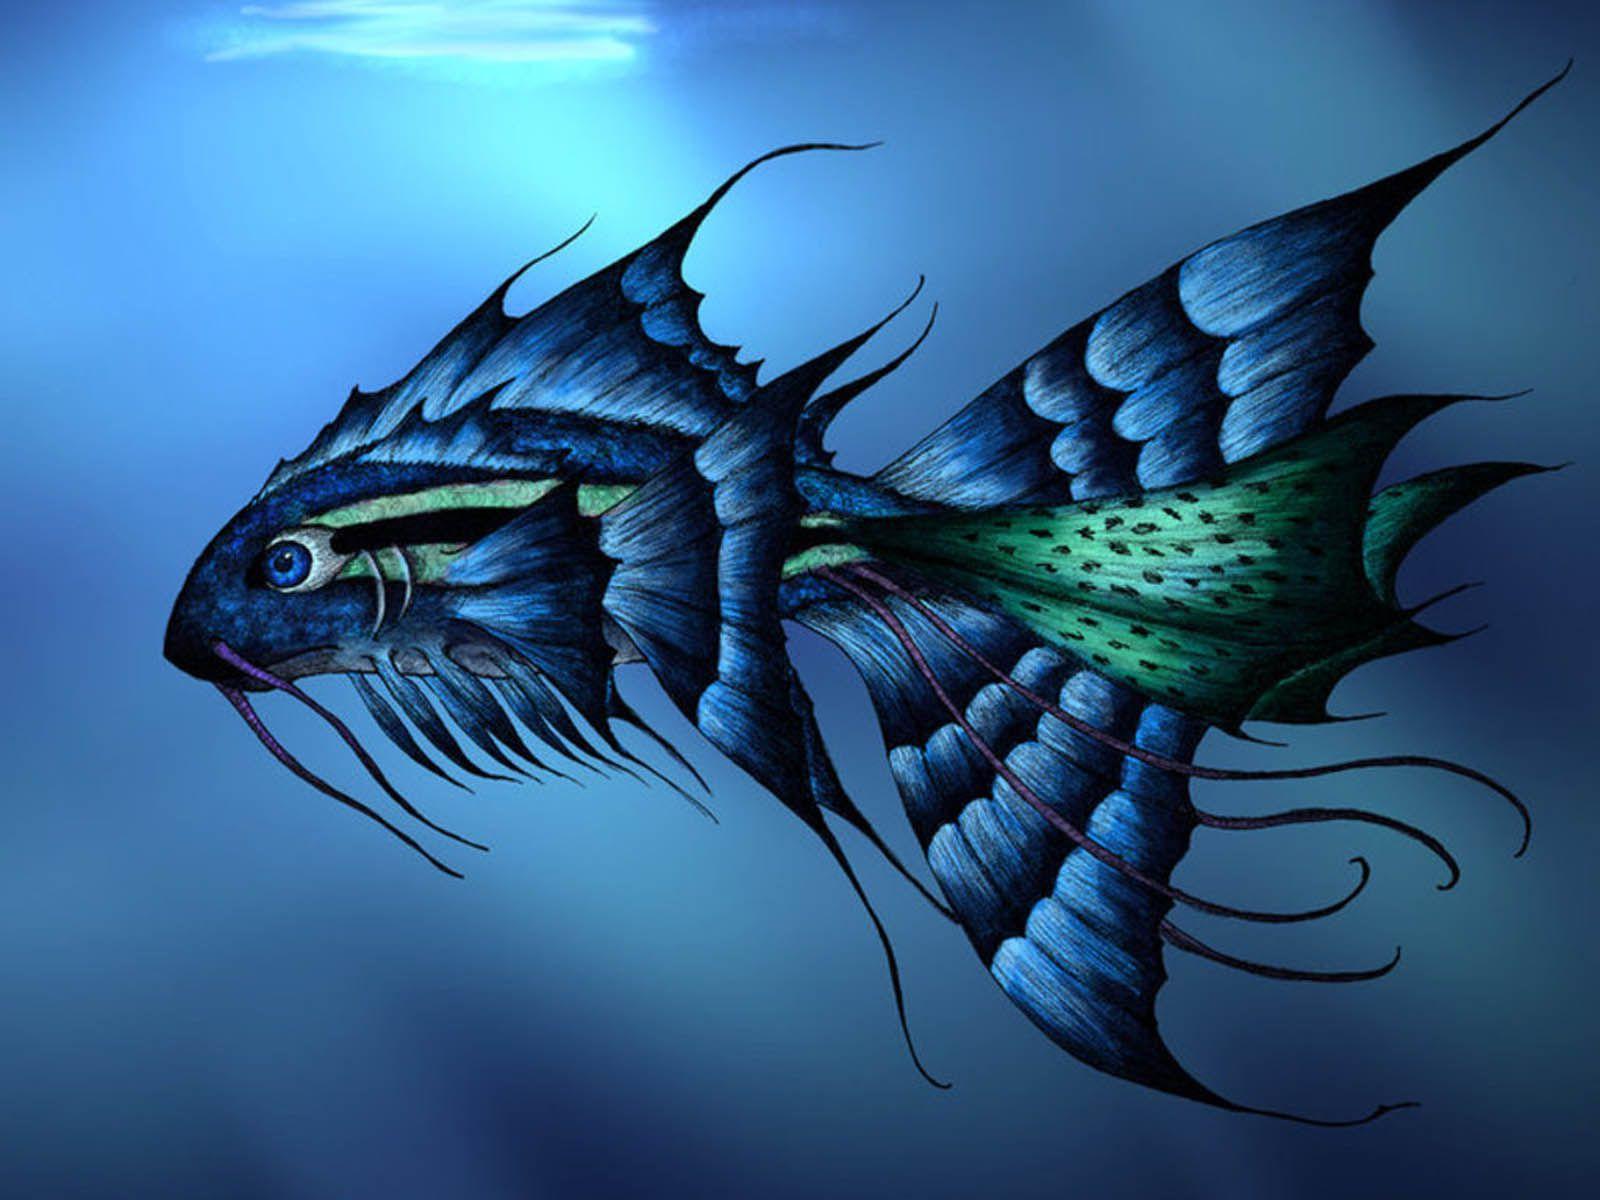 Live fish wallpaper for desktop download 33 wallpapers for Live fish wallpaper